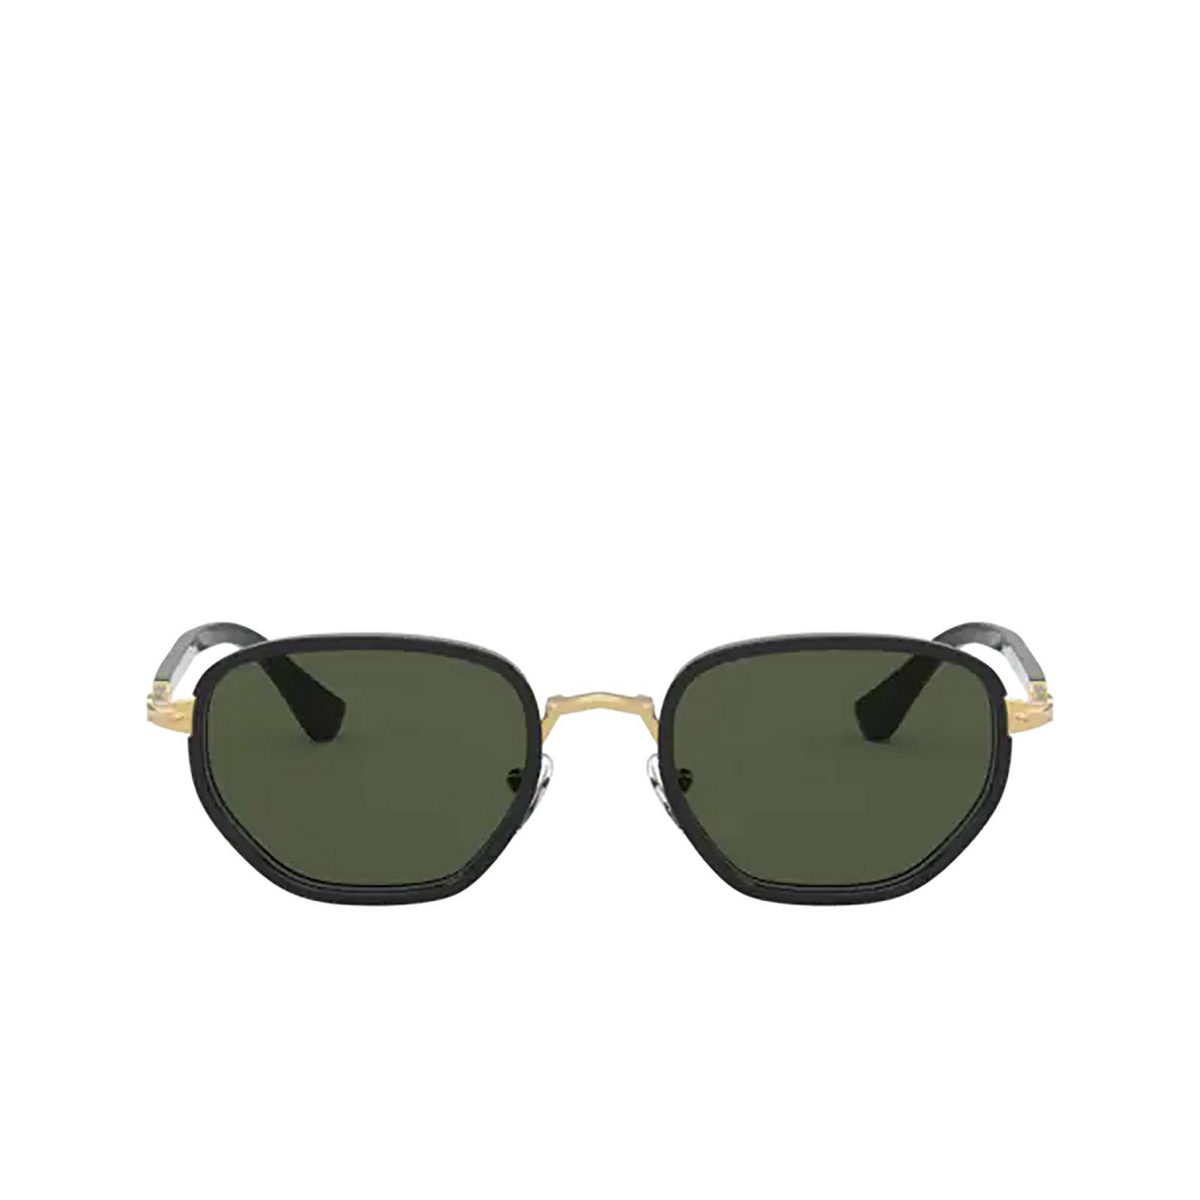 Persol® Irregular Sunglasses: PO2471S color Gold & Black 109731 - front view.